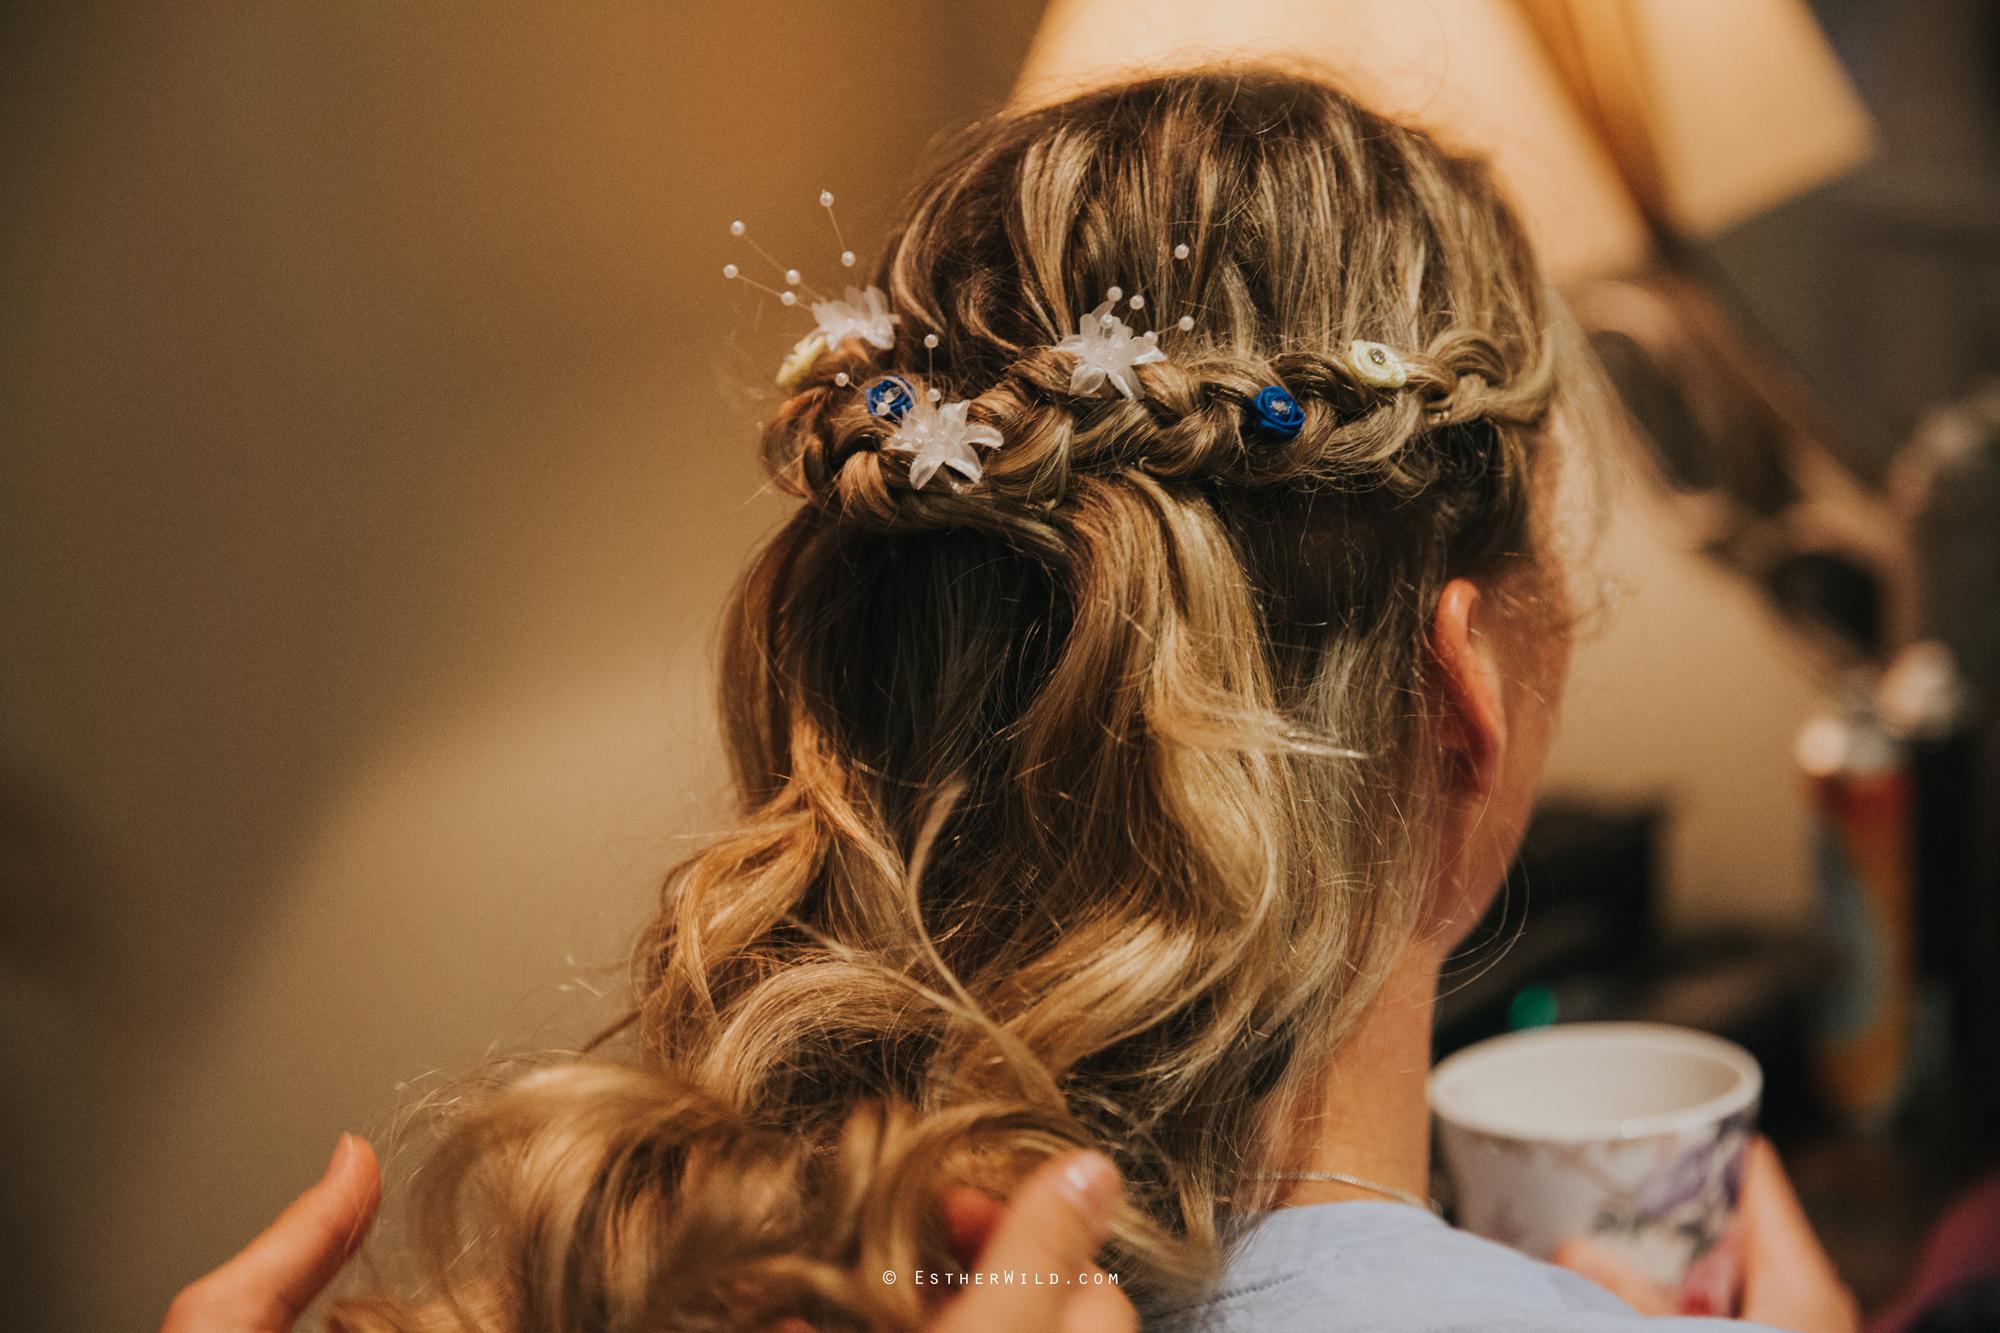 Old_Hall_Ely_Wedding_Esther_Wild_Photographer_IMG_0413.jpg